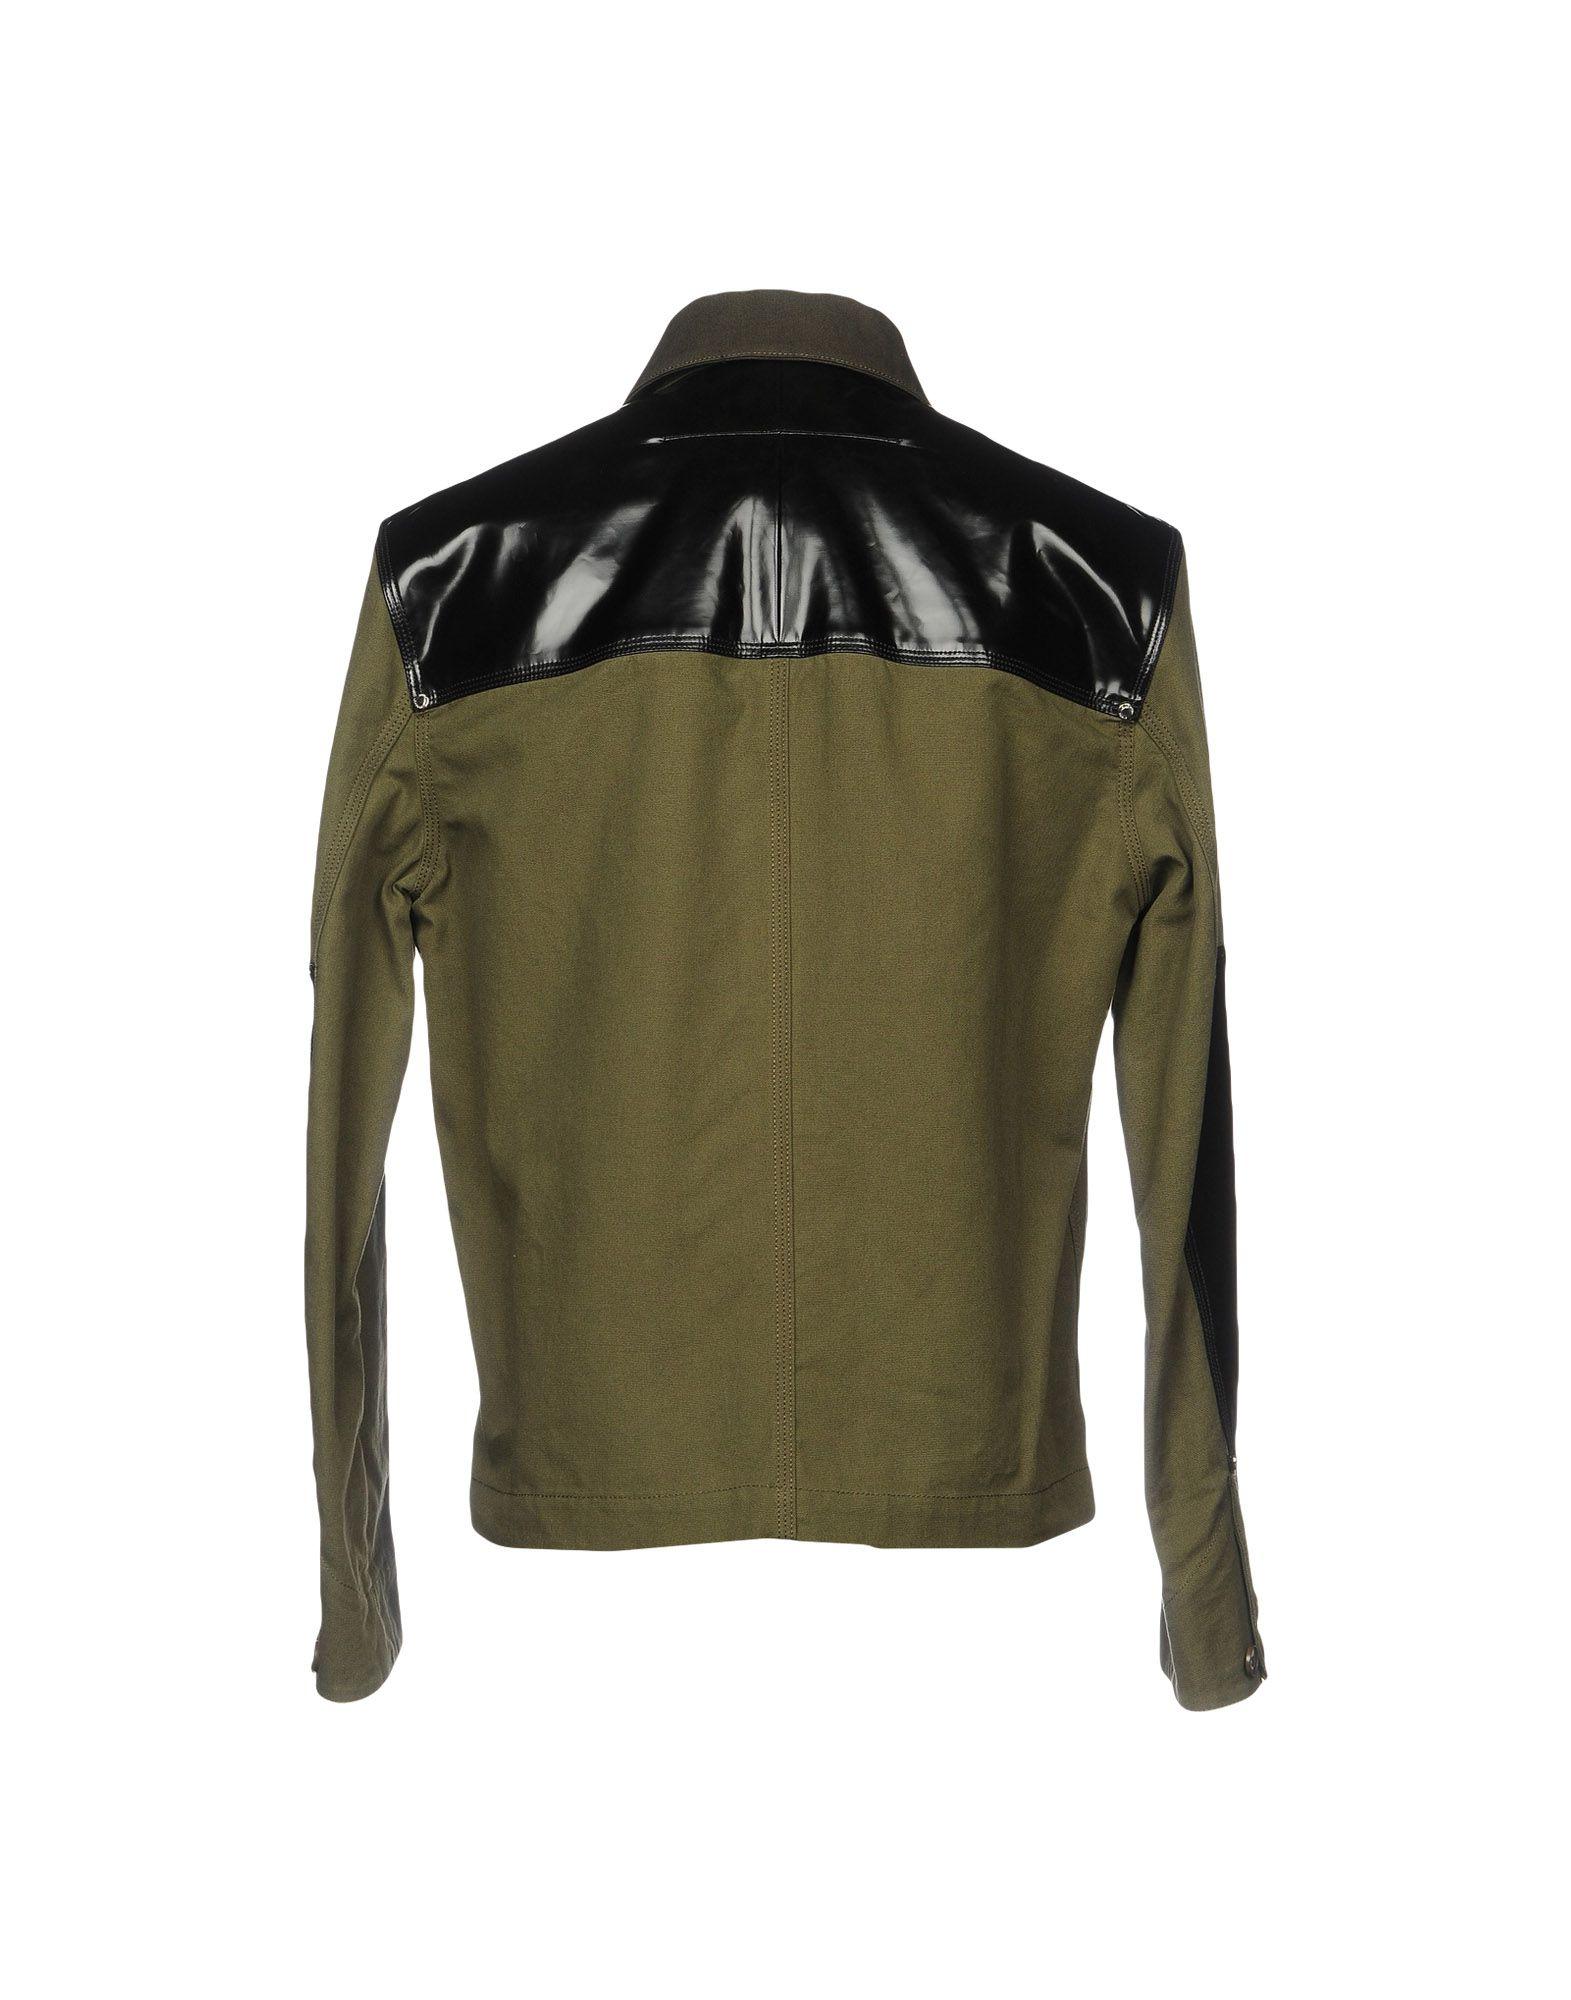 A buon mercato Giubbotto Giubbotto mercato Givenchy Uomo - 41763388LN f90351